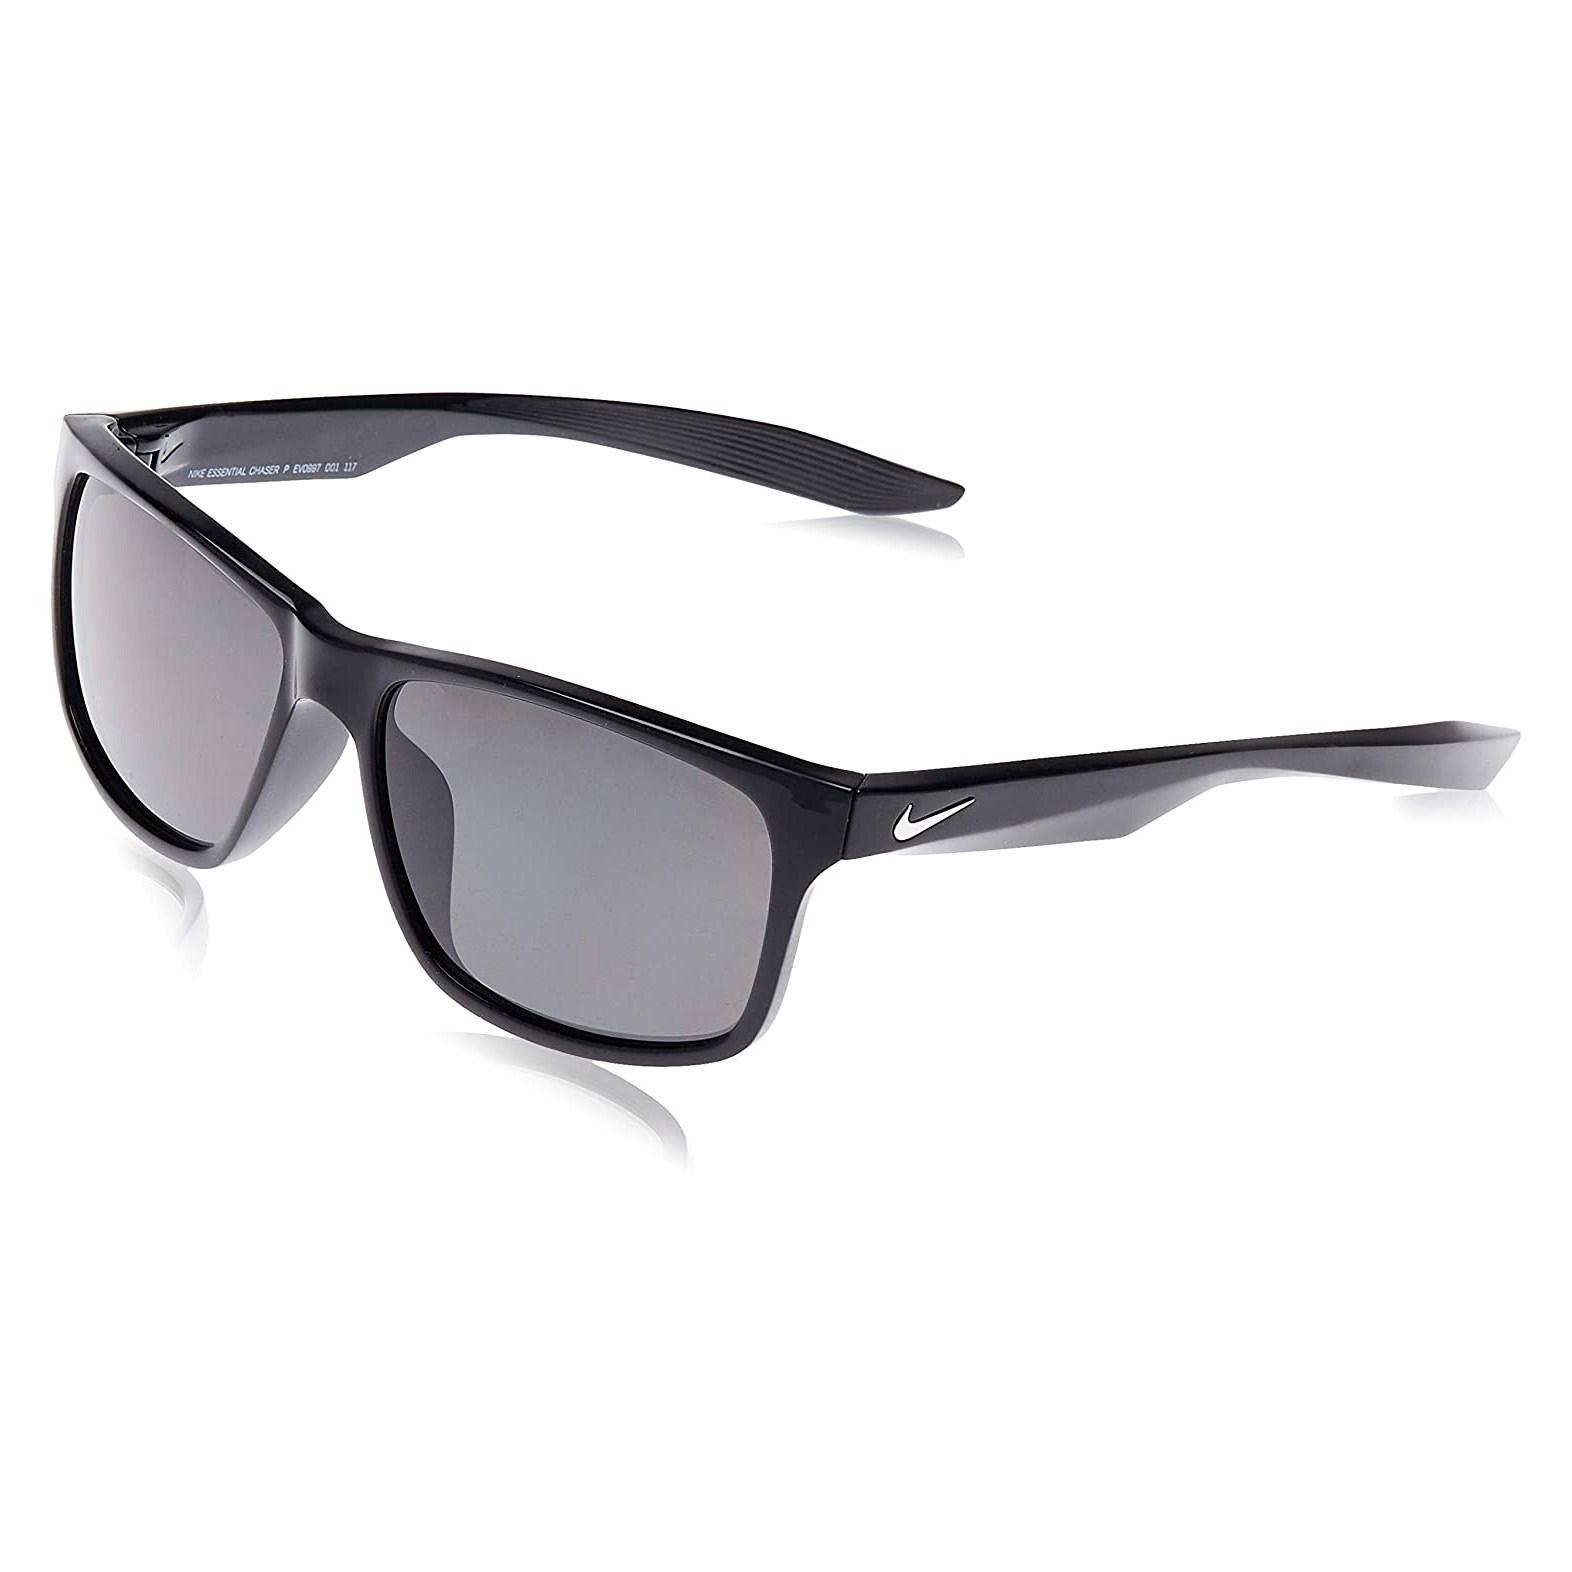 Gafas de hombre nike ev0997-001-316 ev0997-001316